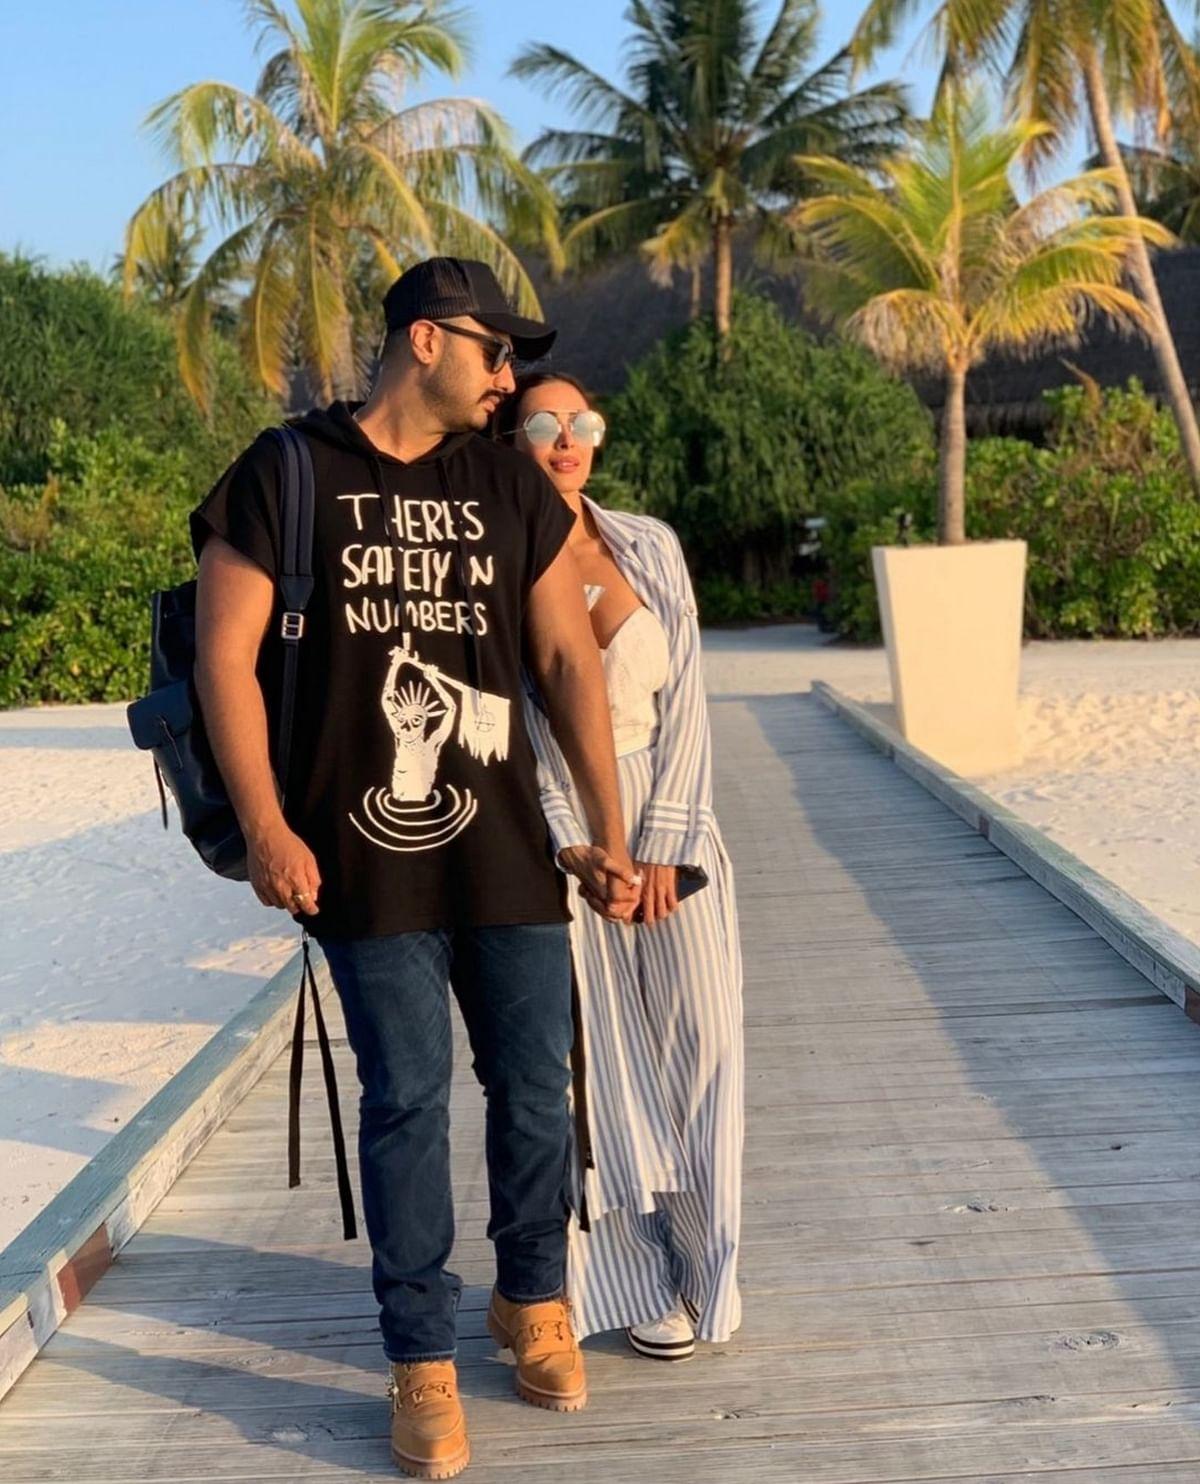 The happy couple- Malaika Arora and Arjun Kapoor strolling